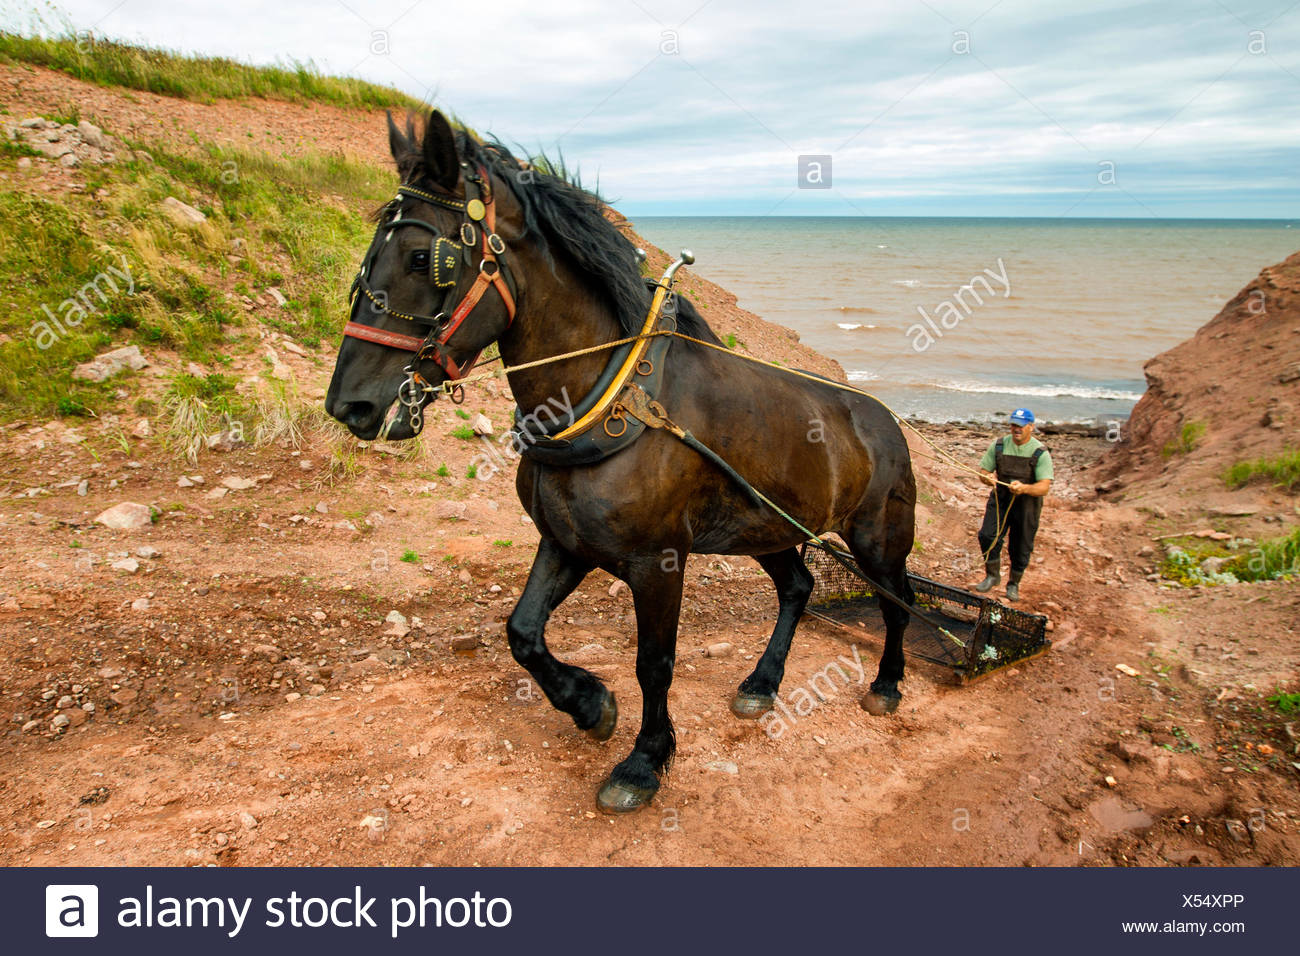 Irish Moss fisherman and Horse, North Cape, Prince Edward Island, Canada - Stock Image